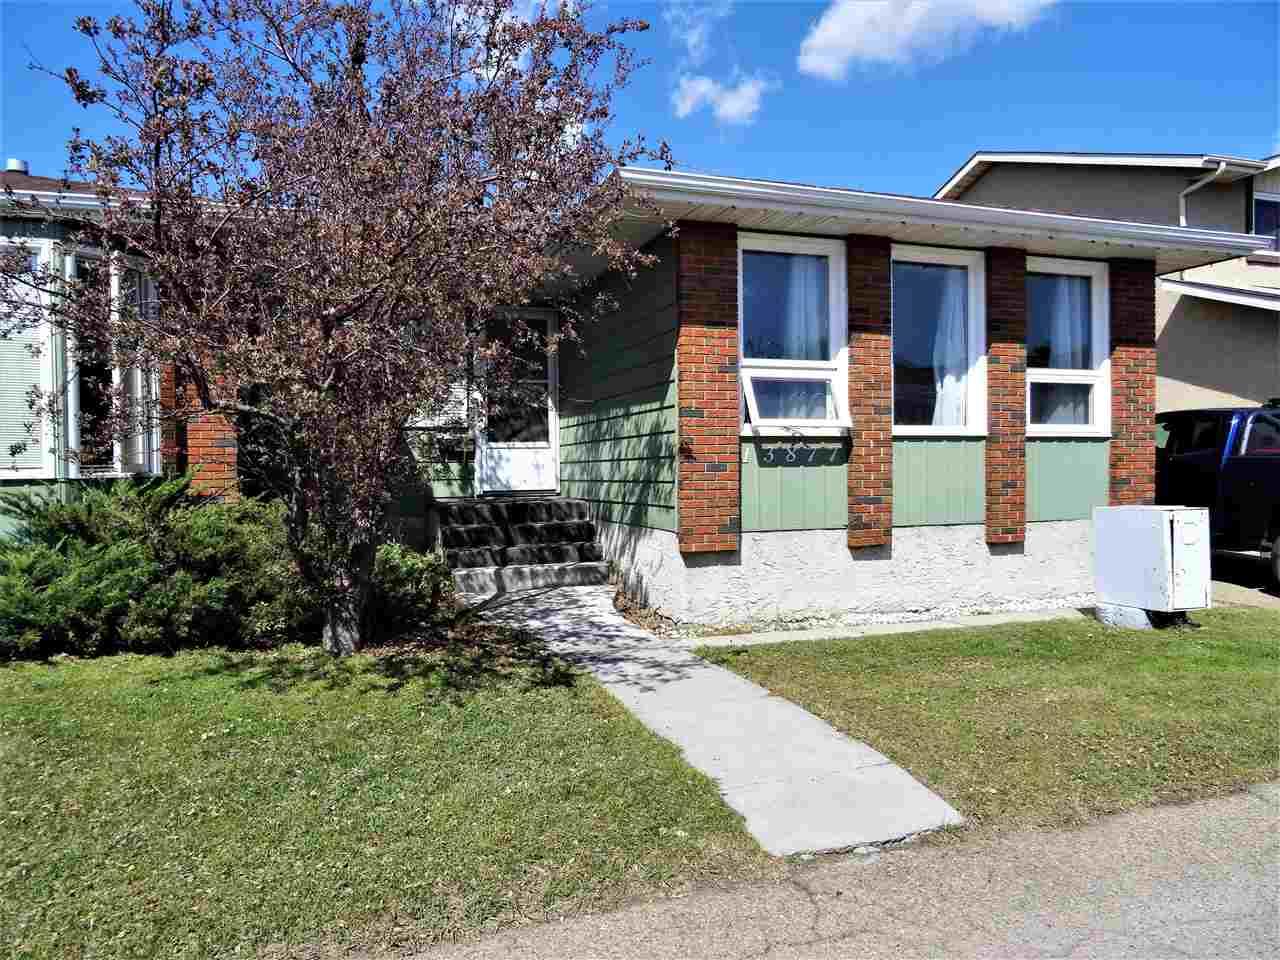 13877 114 Street, 3 bed, 1 bath, at $189,000